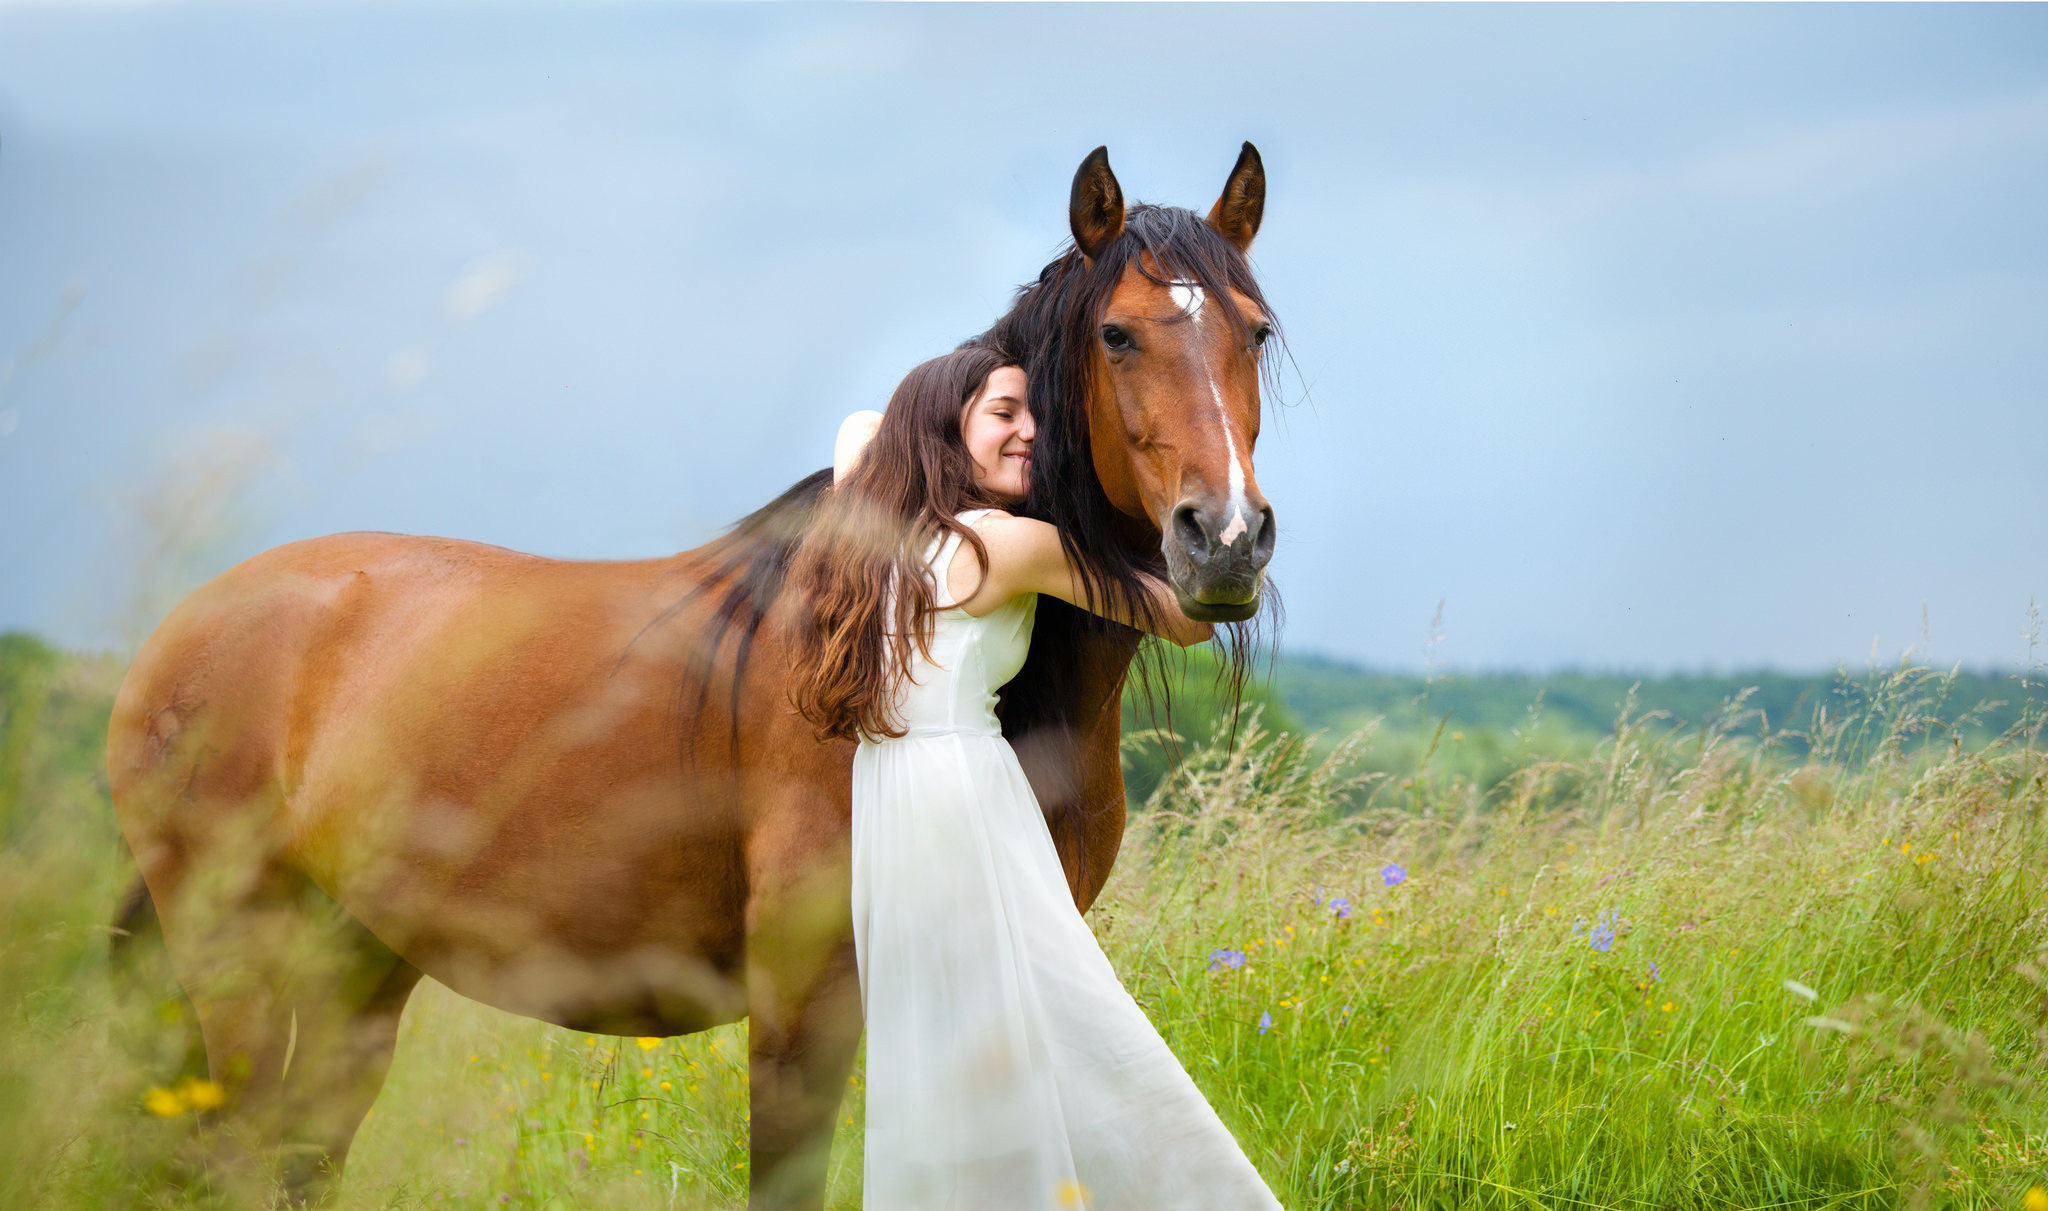 с коне девушка